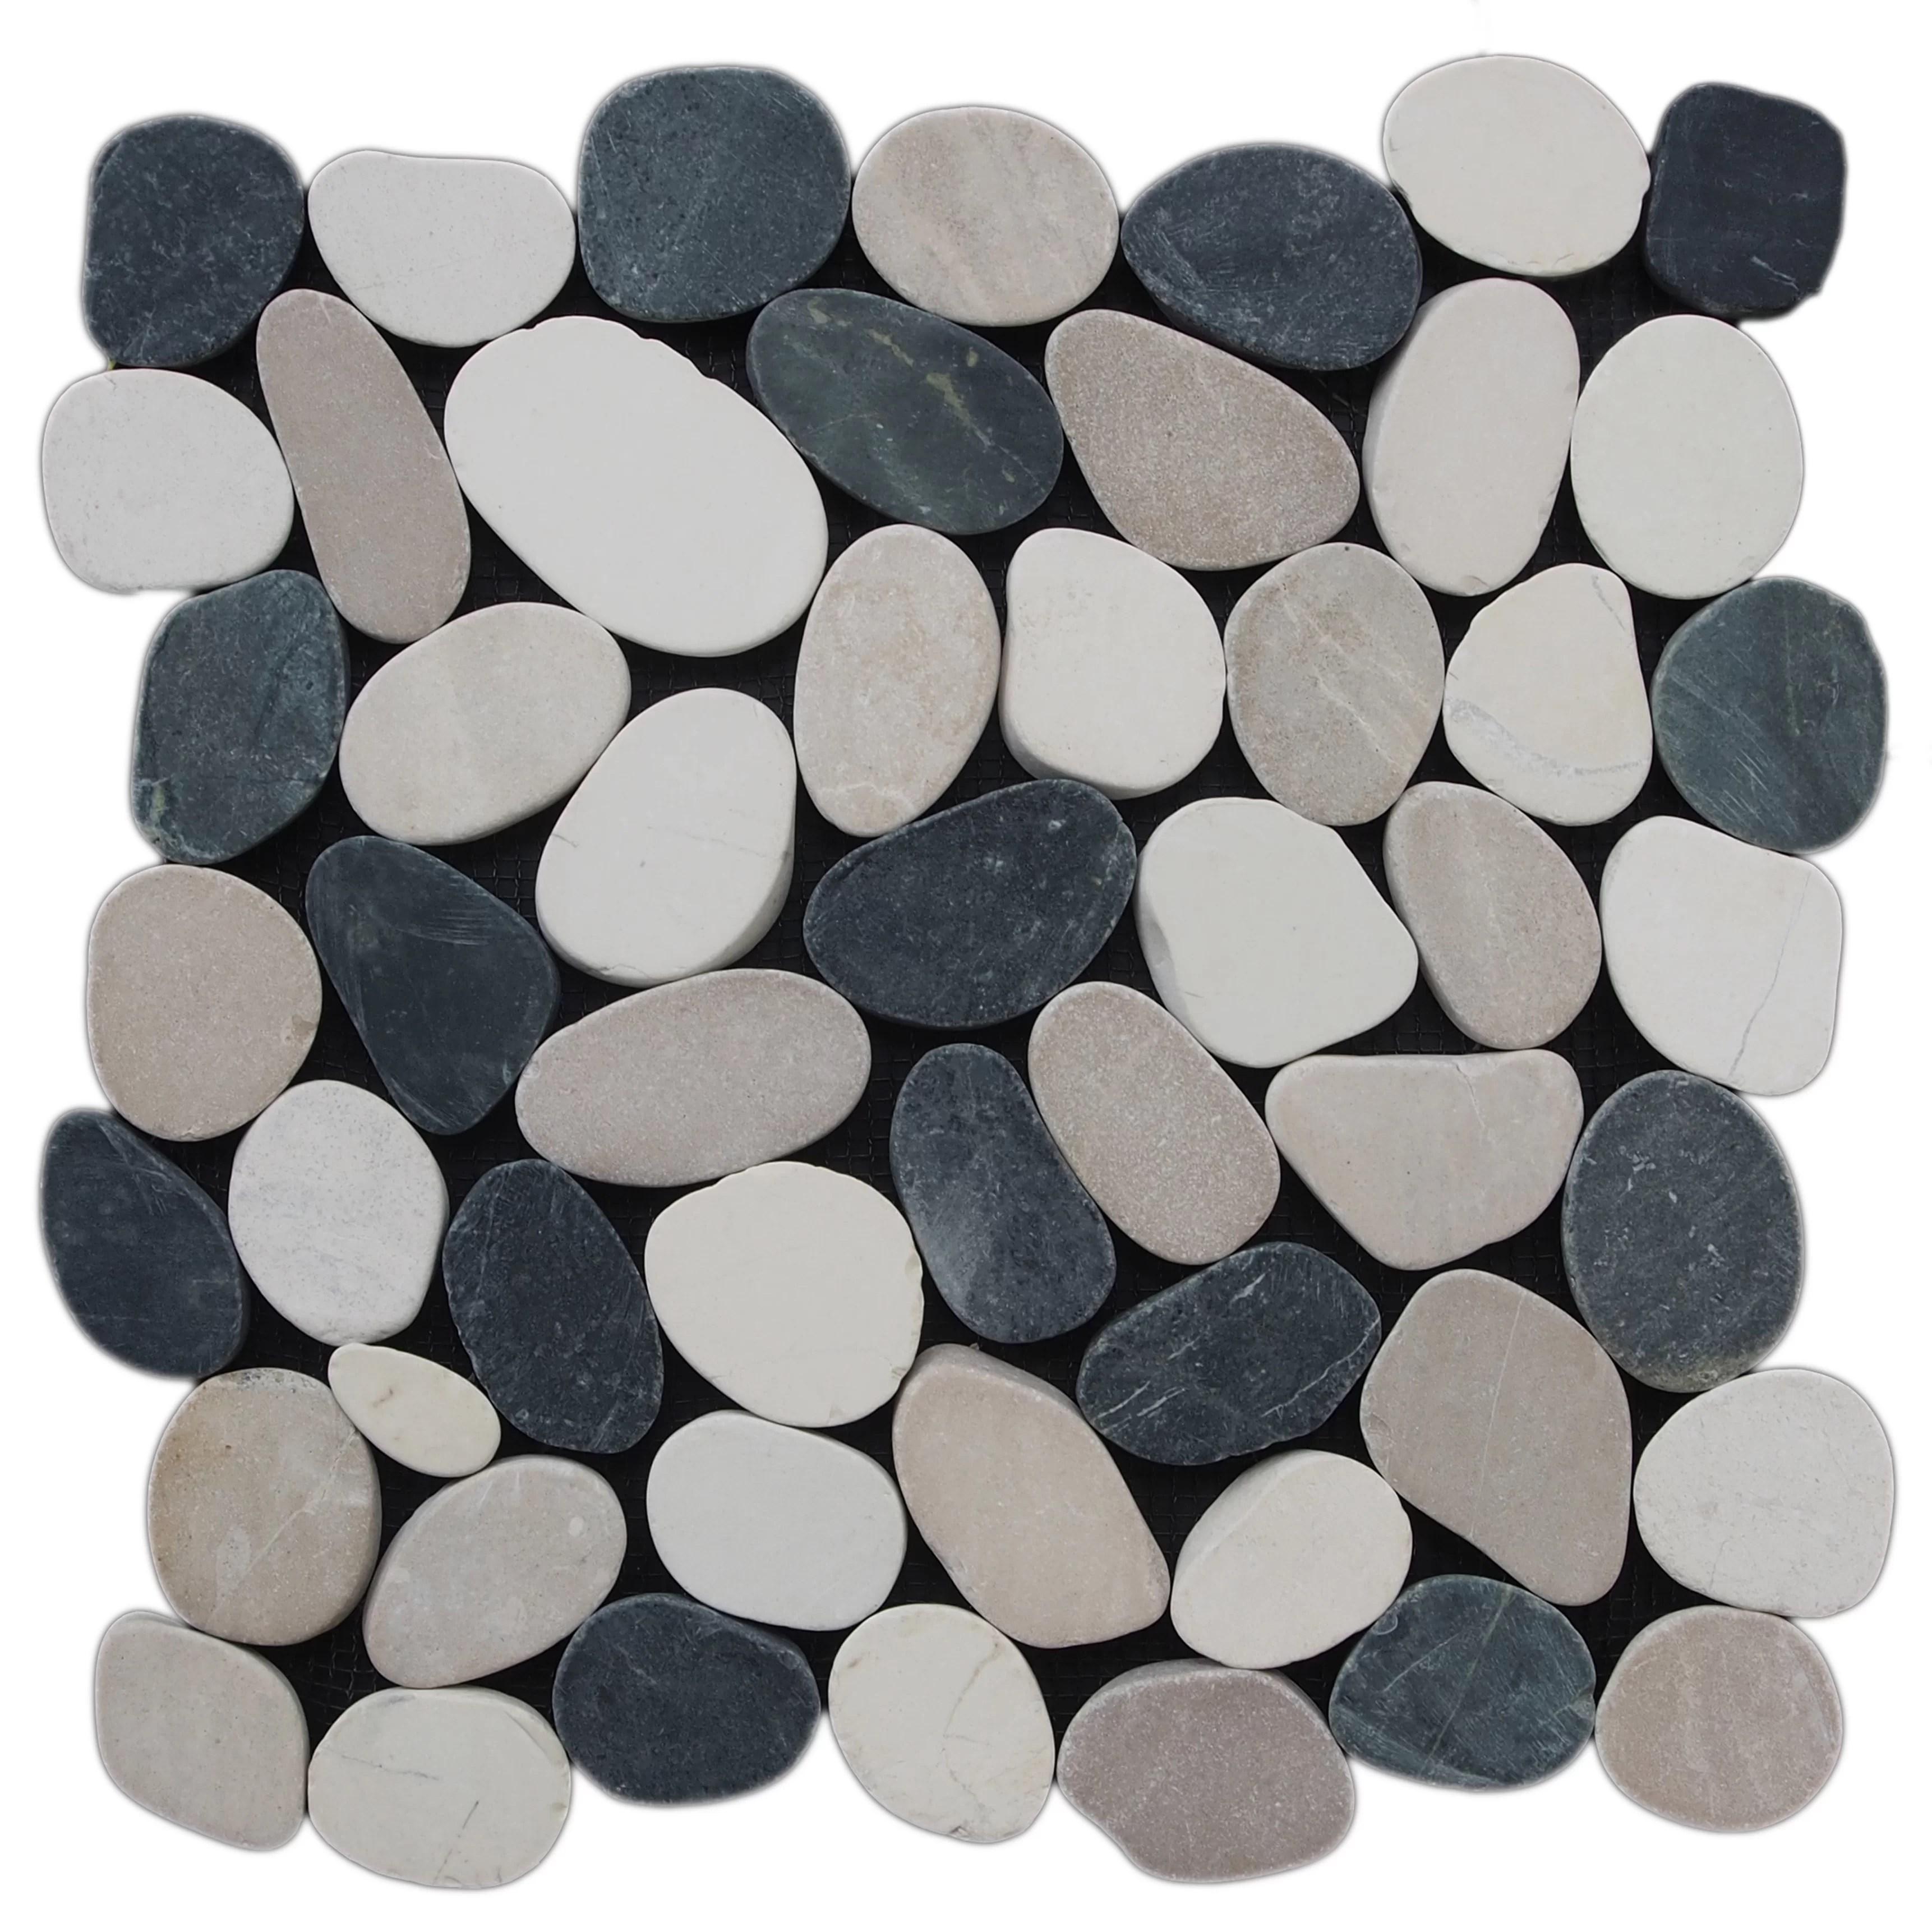 random sized natural stone pebble mosaic wall floor tile